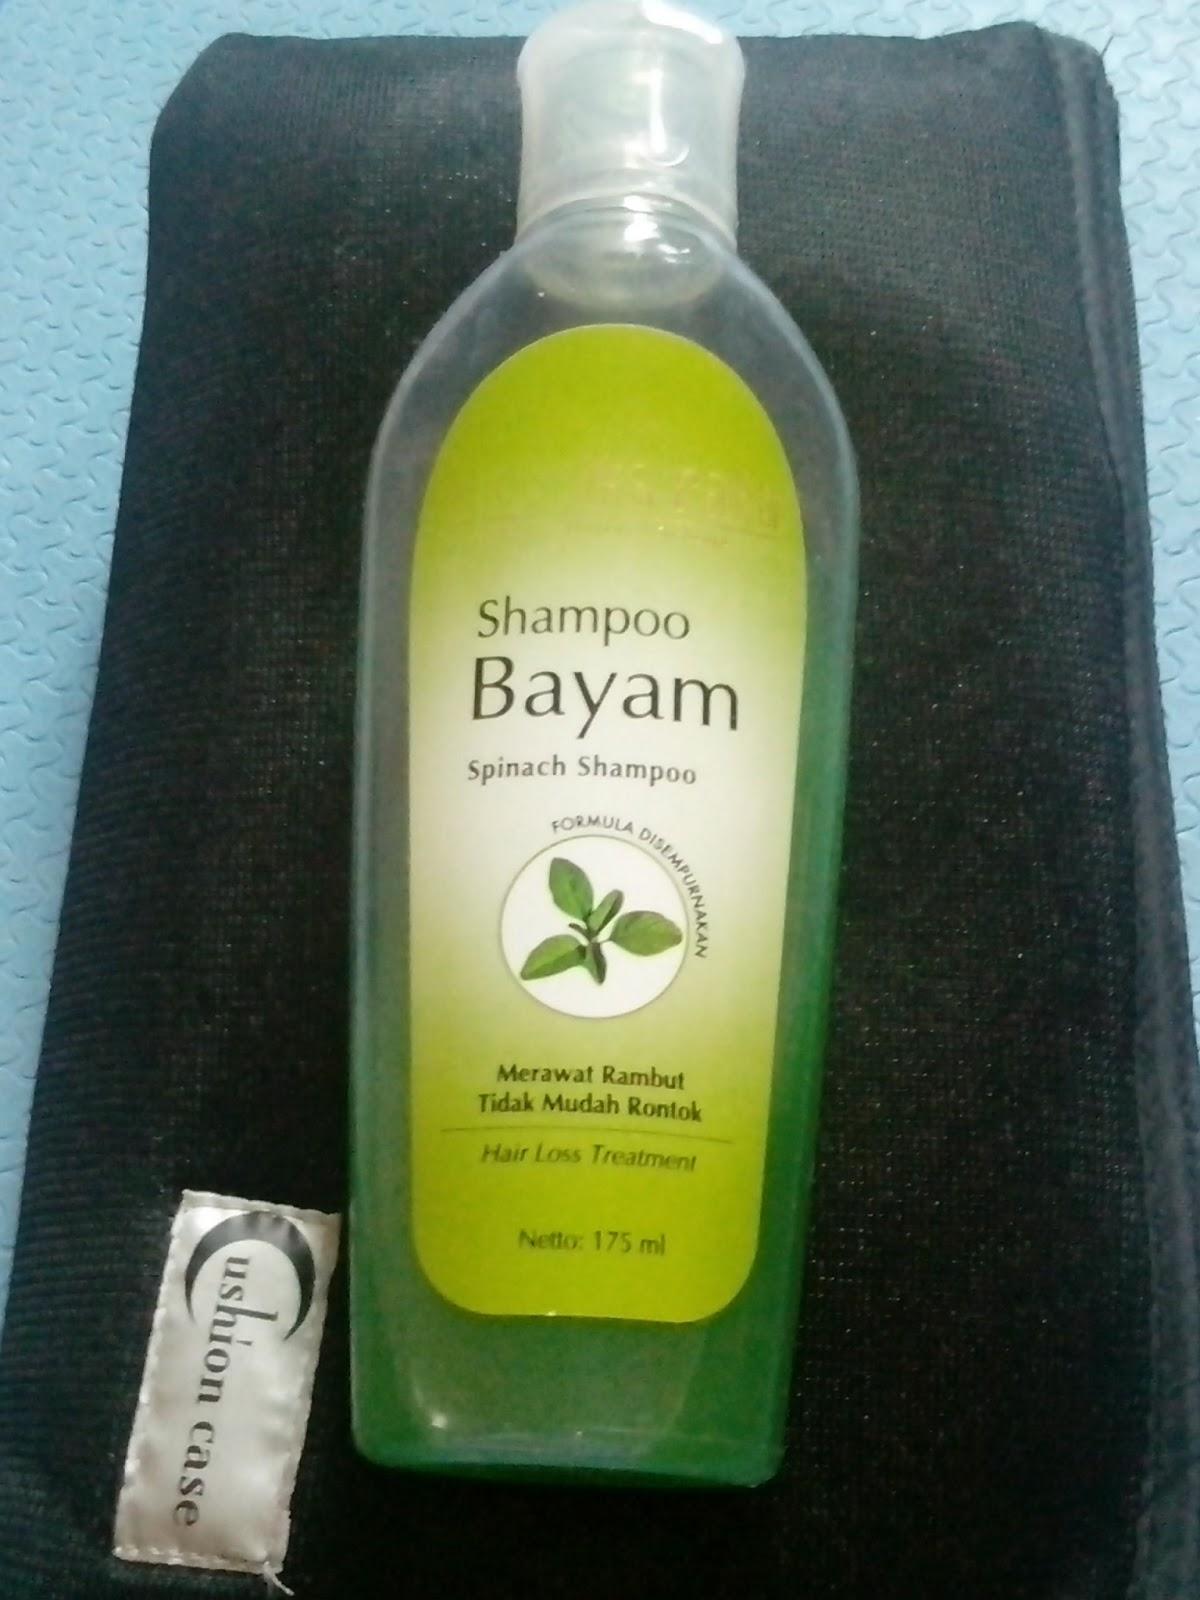 Mustika Ratu Shampoo Bayam Merawat Rambut Tidak Mudah Rontok 175ml Best Seller Perawatan Akar Kuat Dan Sehat